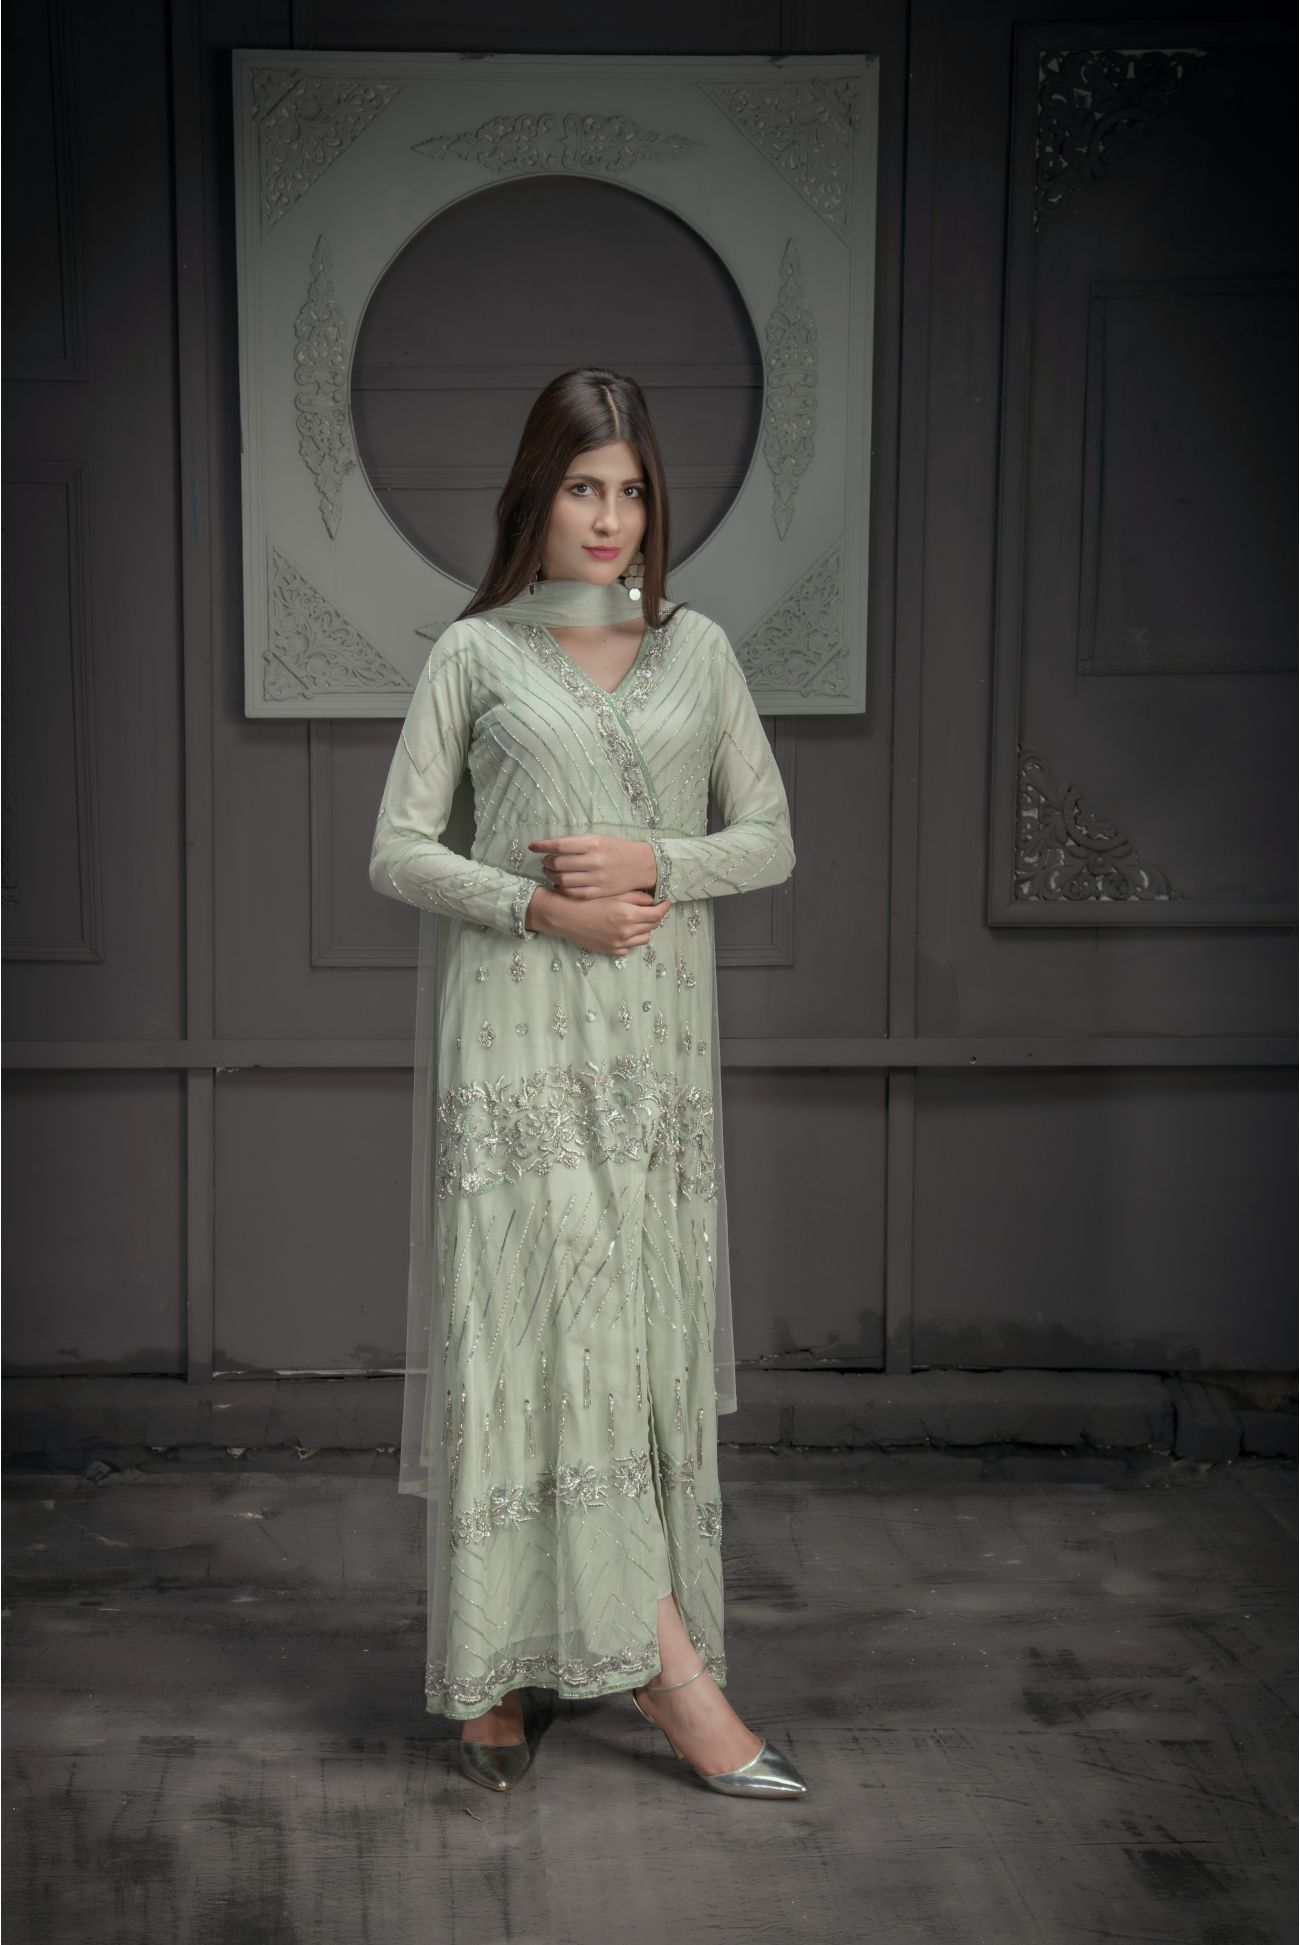 Buy Exclusive Mint Green Bridal Wear – Zbd15 Online In USA, Uk & Pakistan - 04